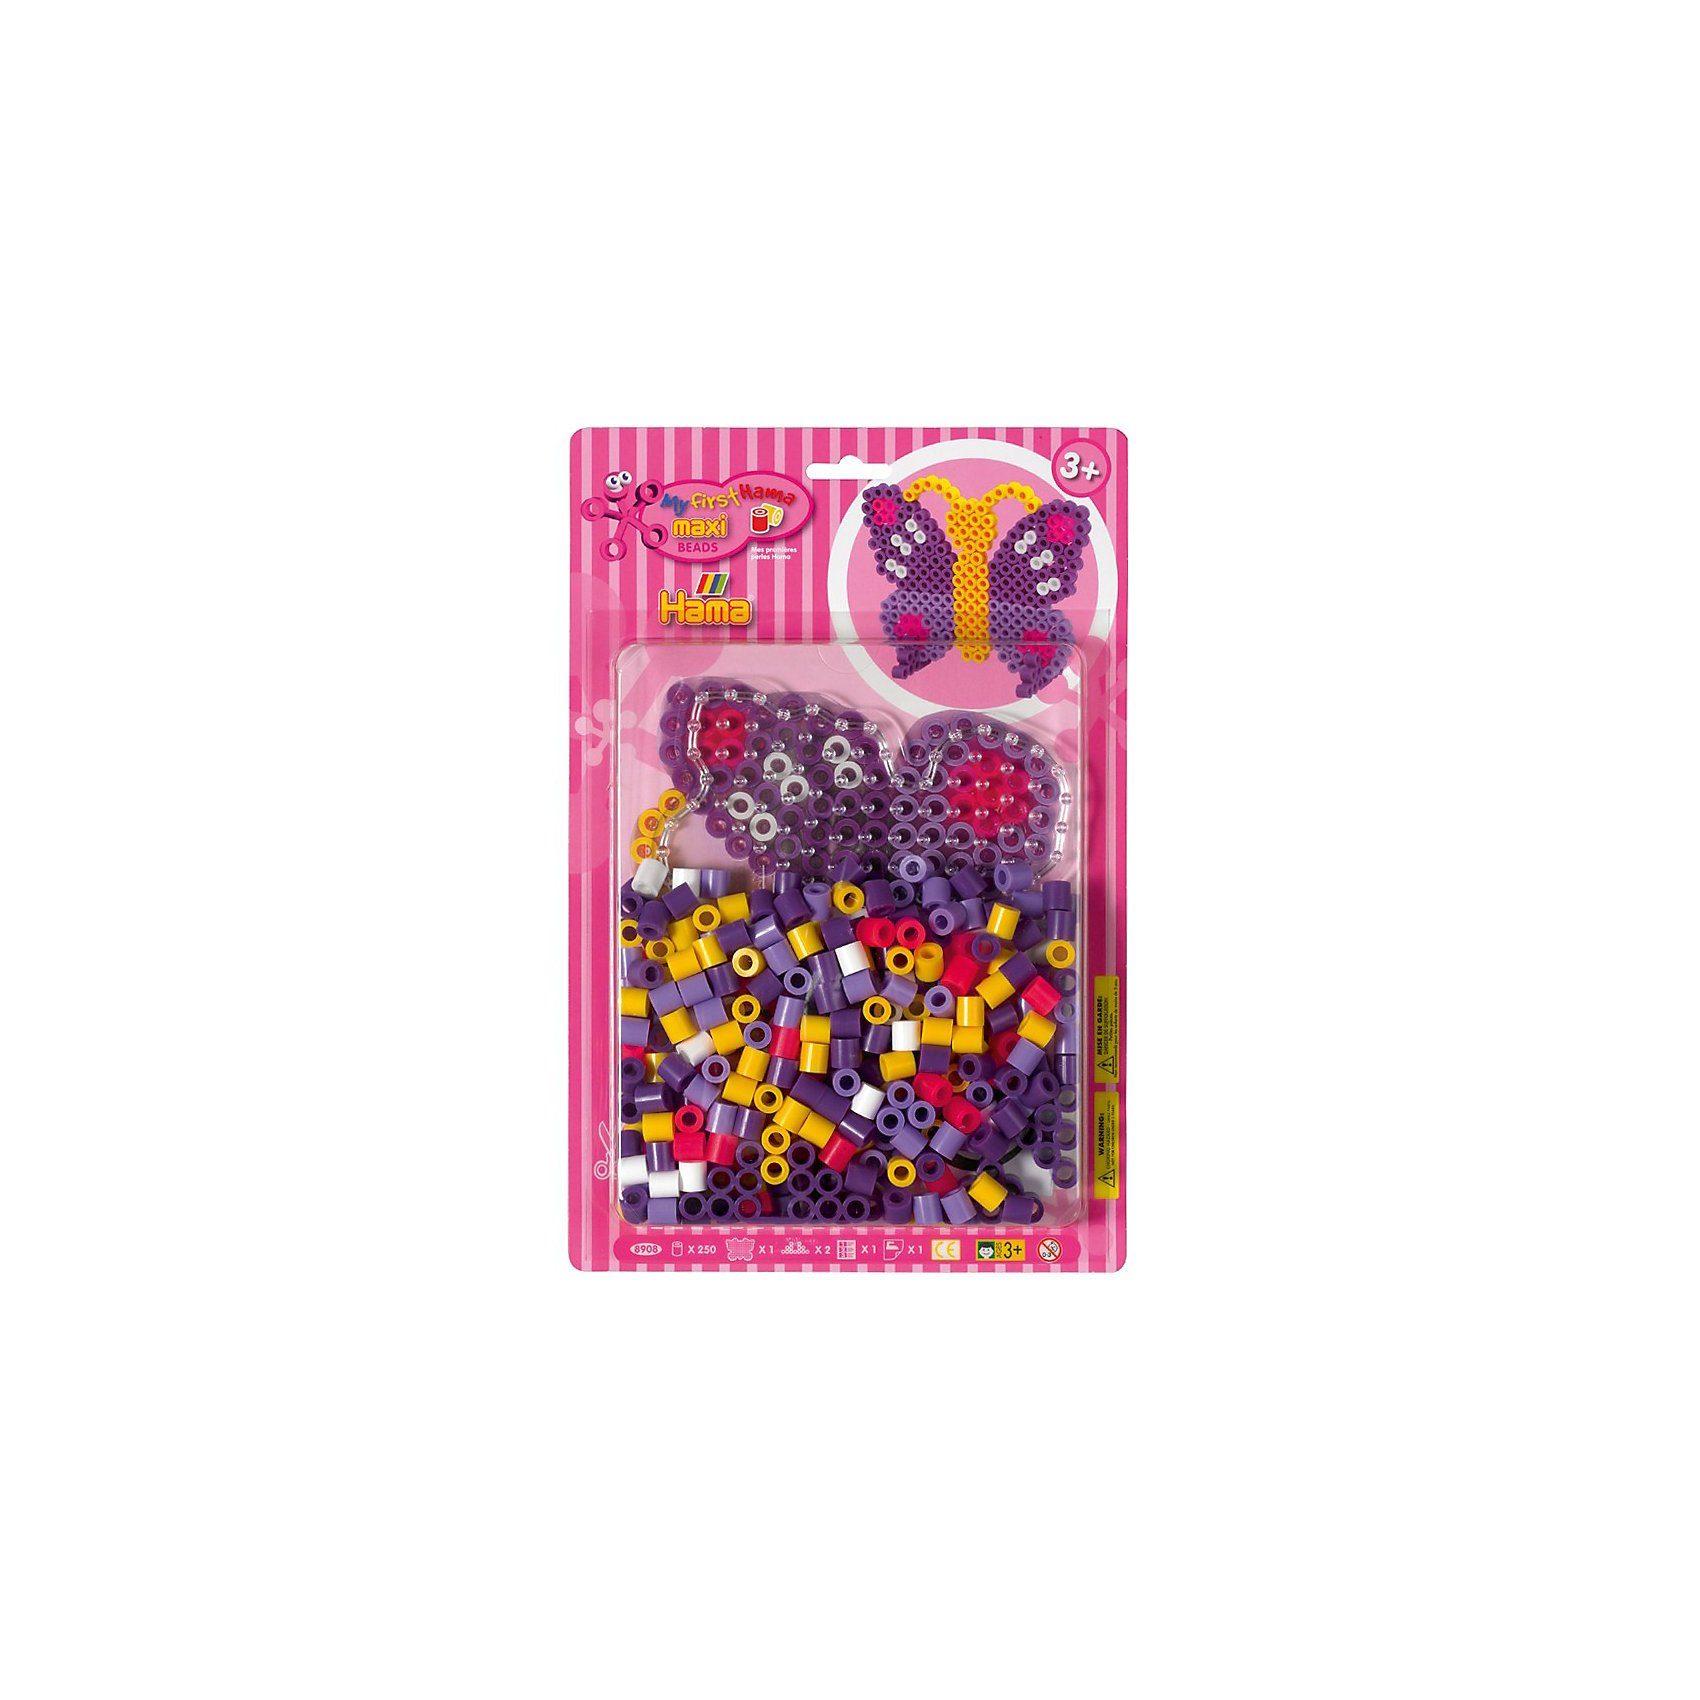 Hama Perlen HAMA 8908 Blister Schmetterling, 250 maxi-Perlen & Zubehör